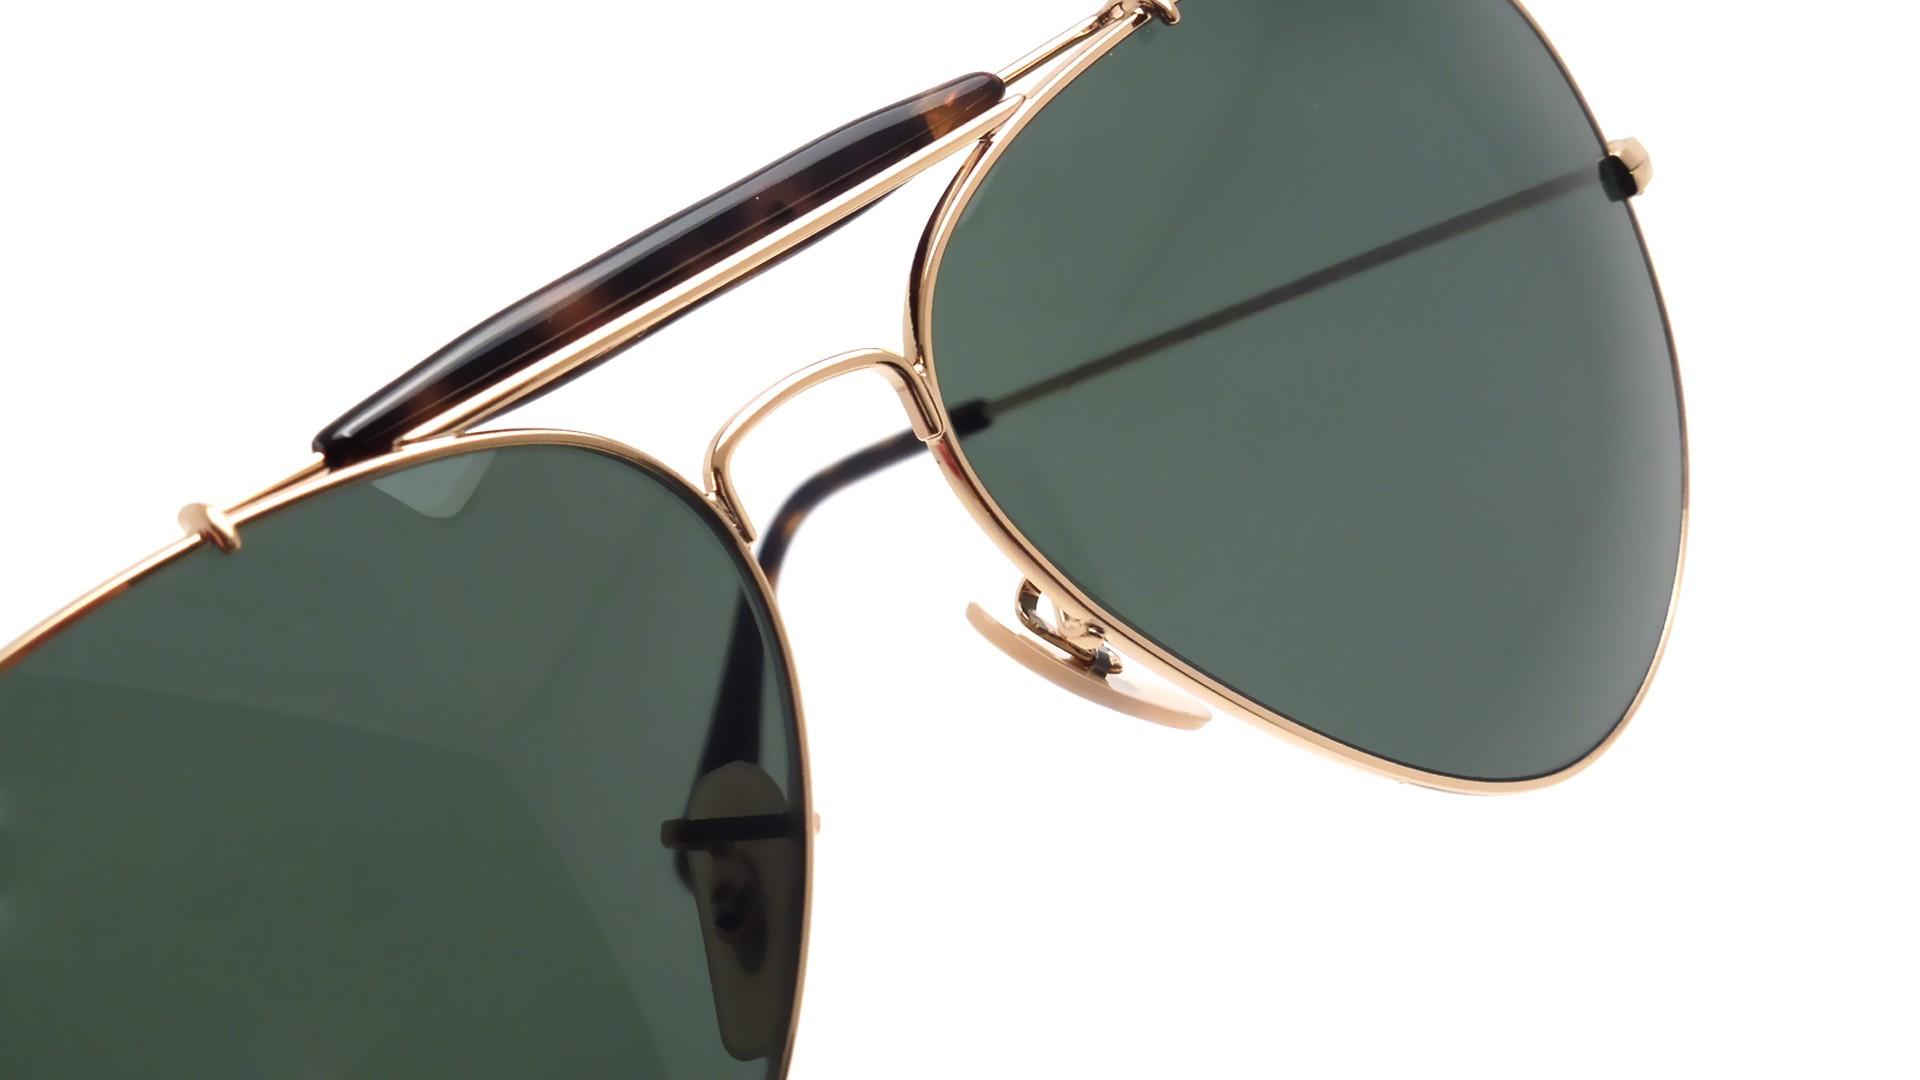 3e9c0b9948030 Sunglasses Ray-Ban Outdoorsman II Havane Gold RB3029 181 62-14 Large